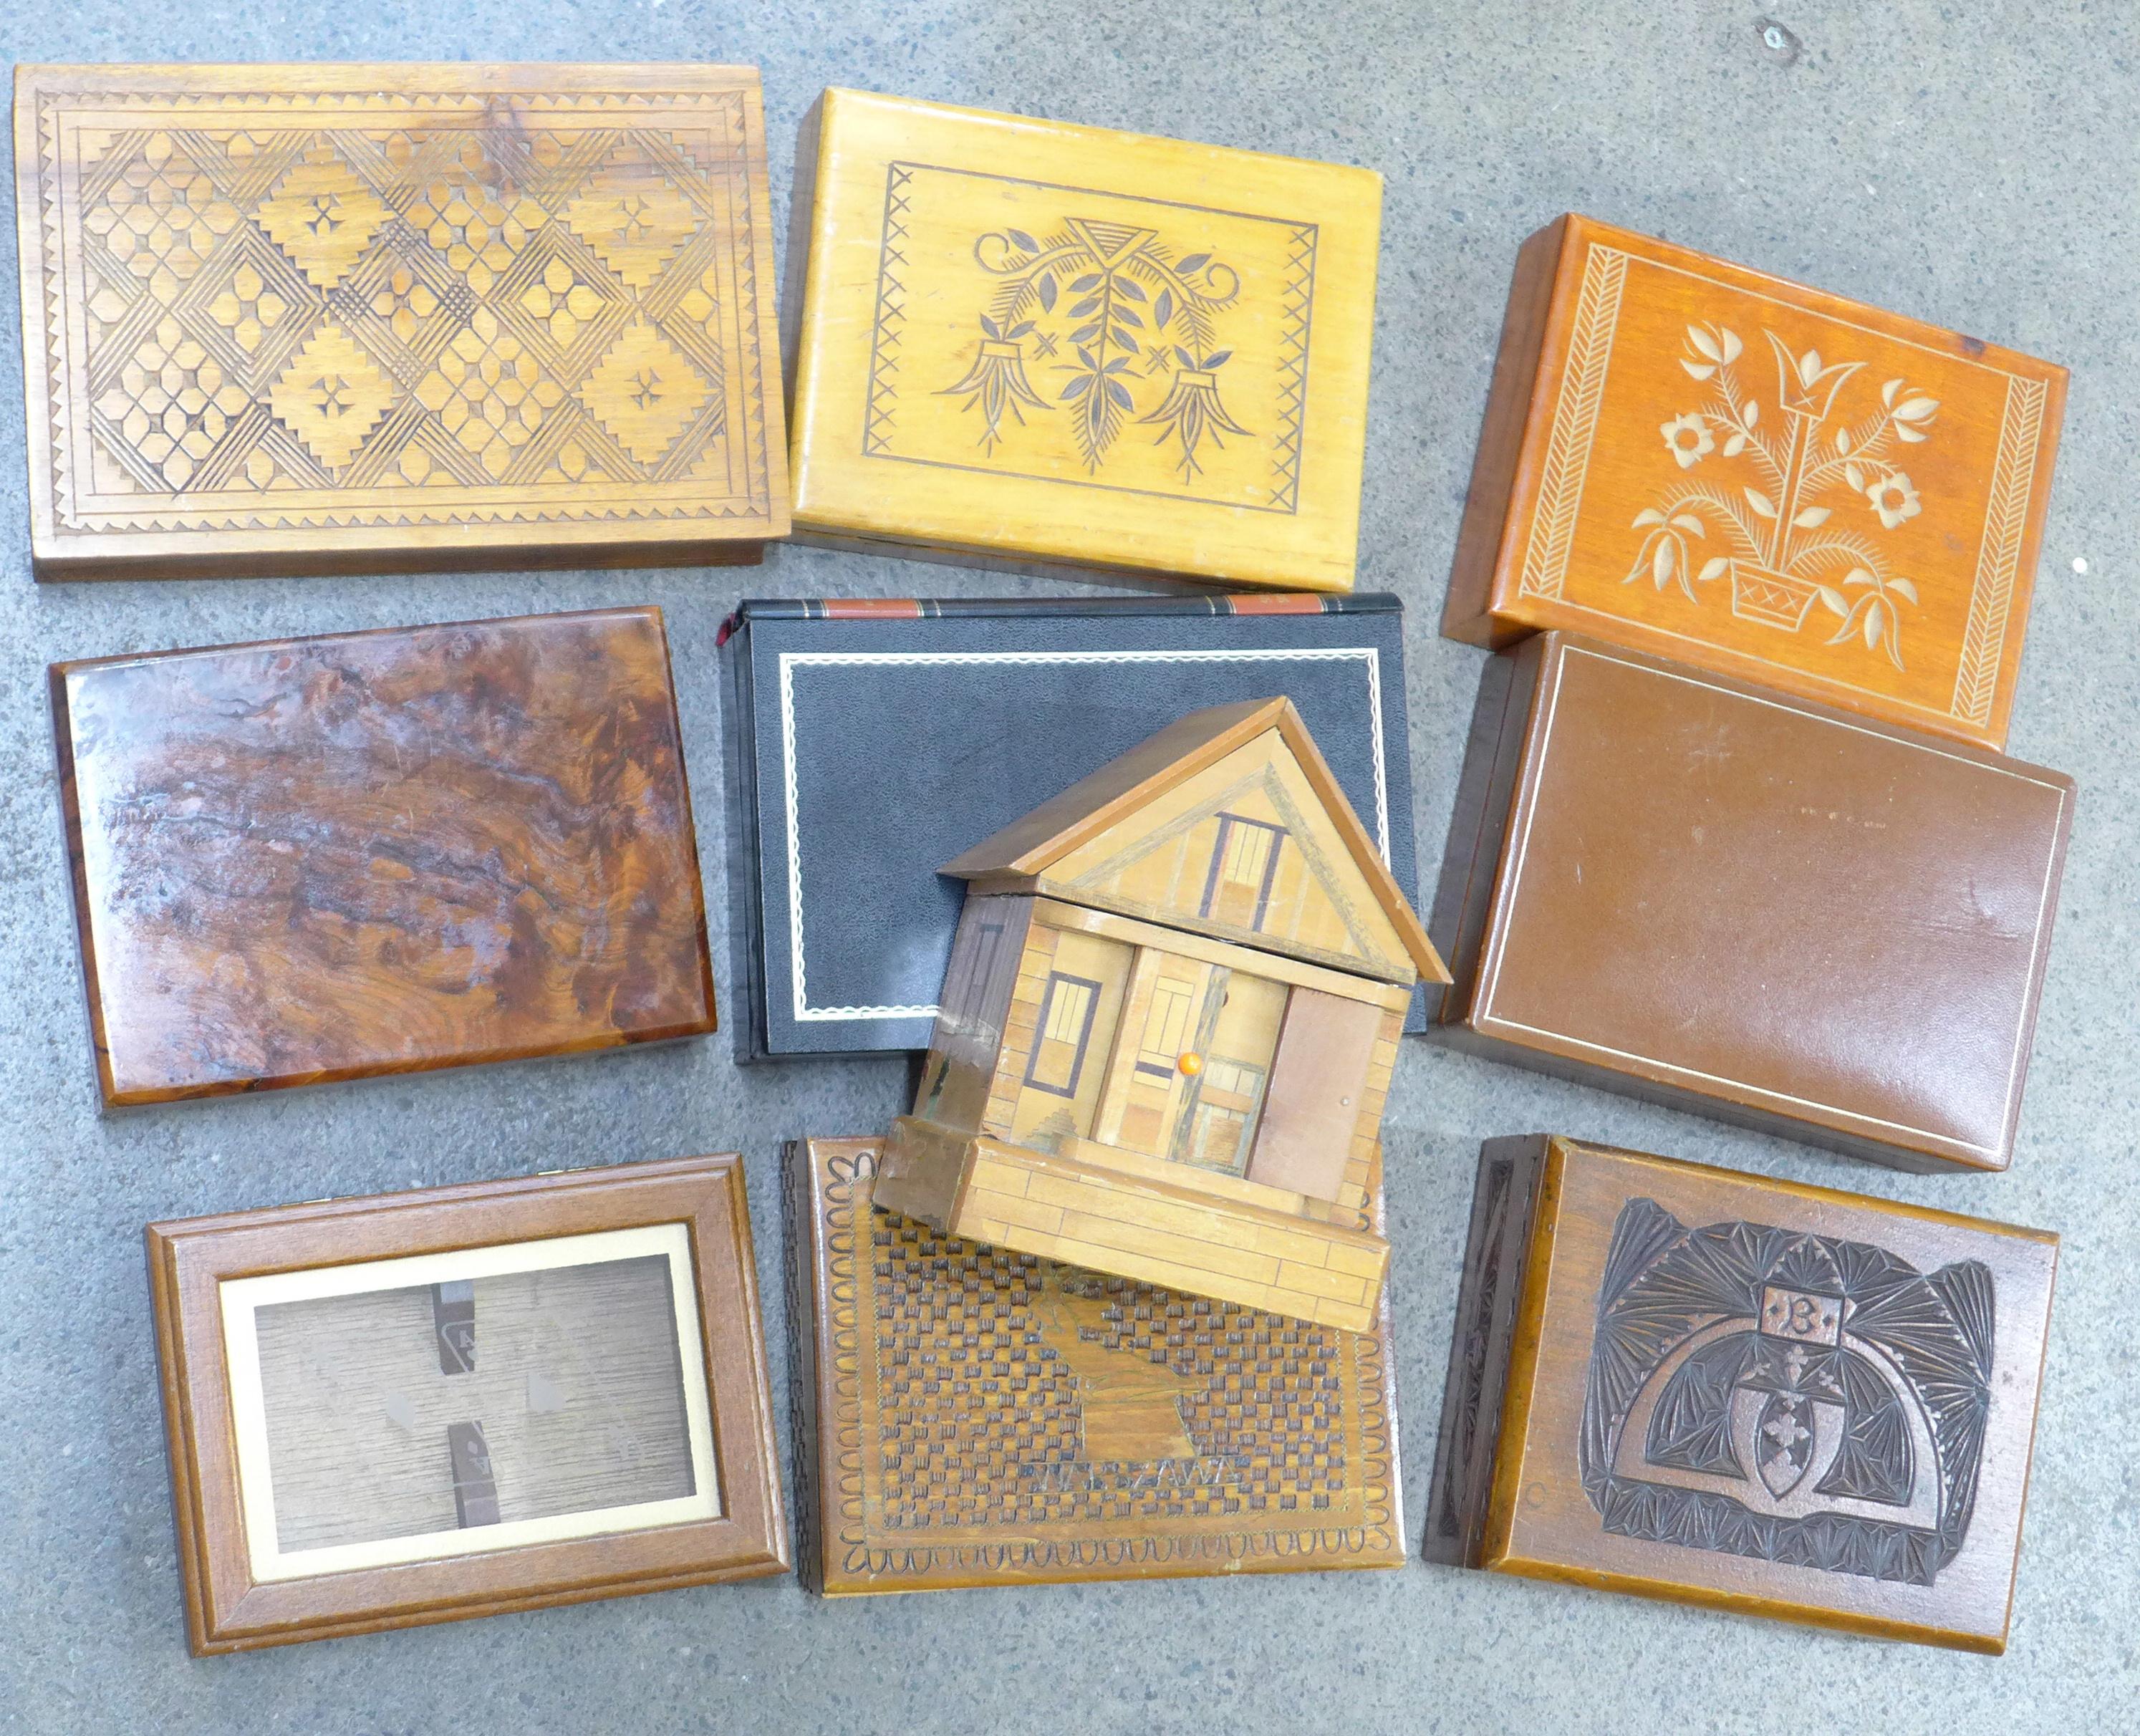 Lot 643 - Ten wooden boxes including a money bank